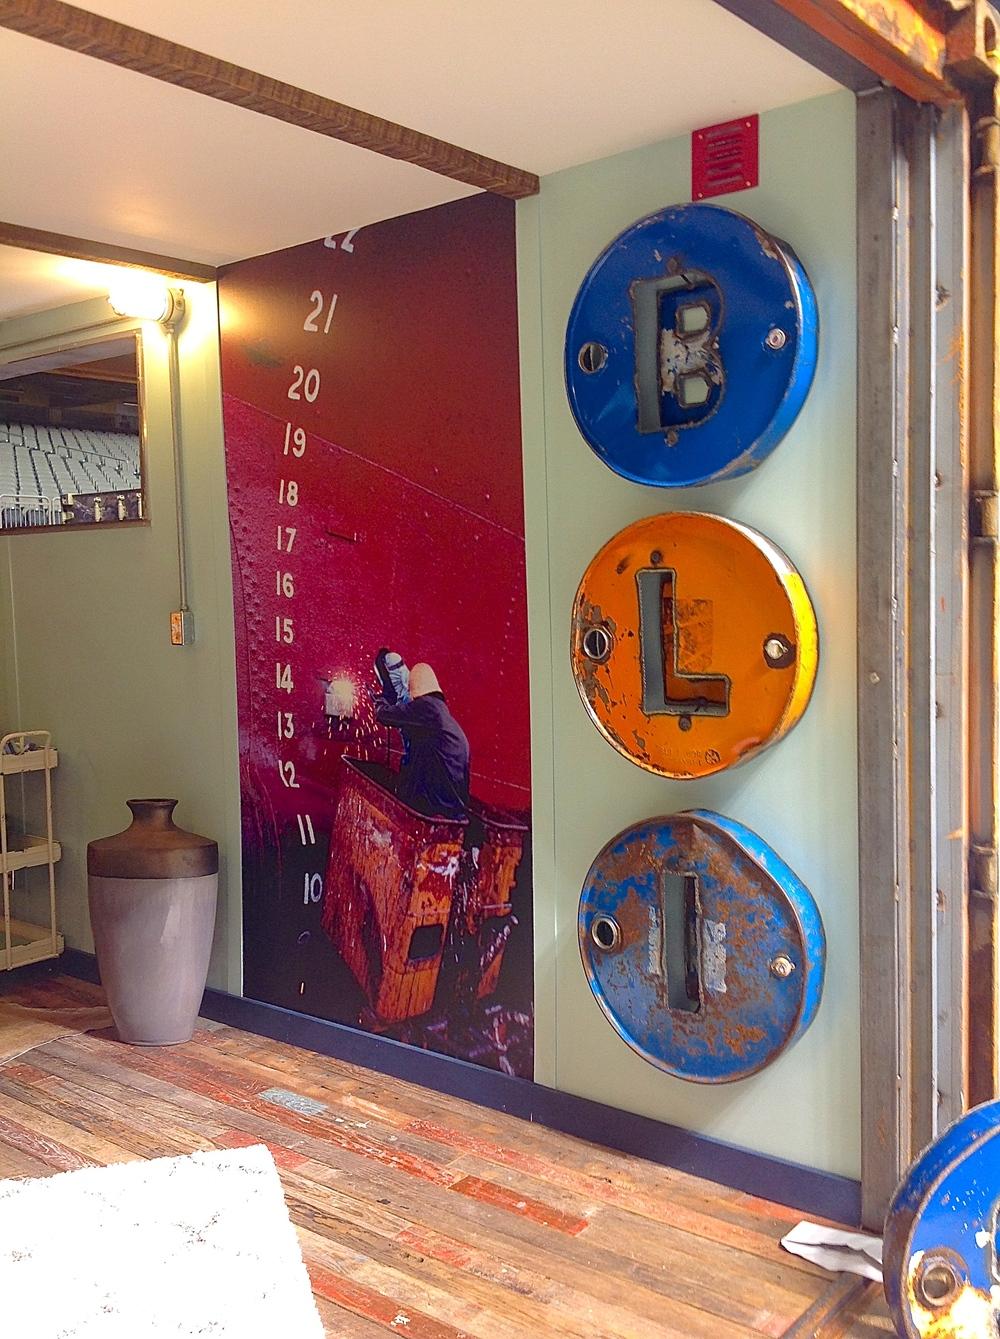 Metal barrel decor on the wall!